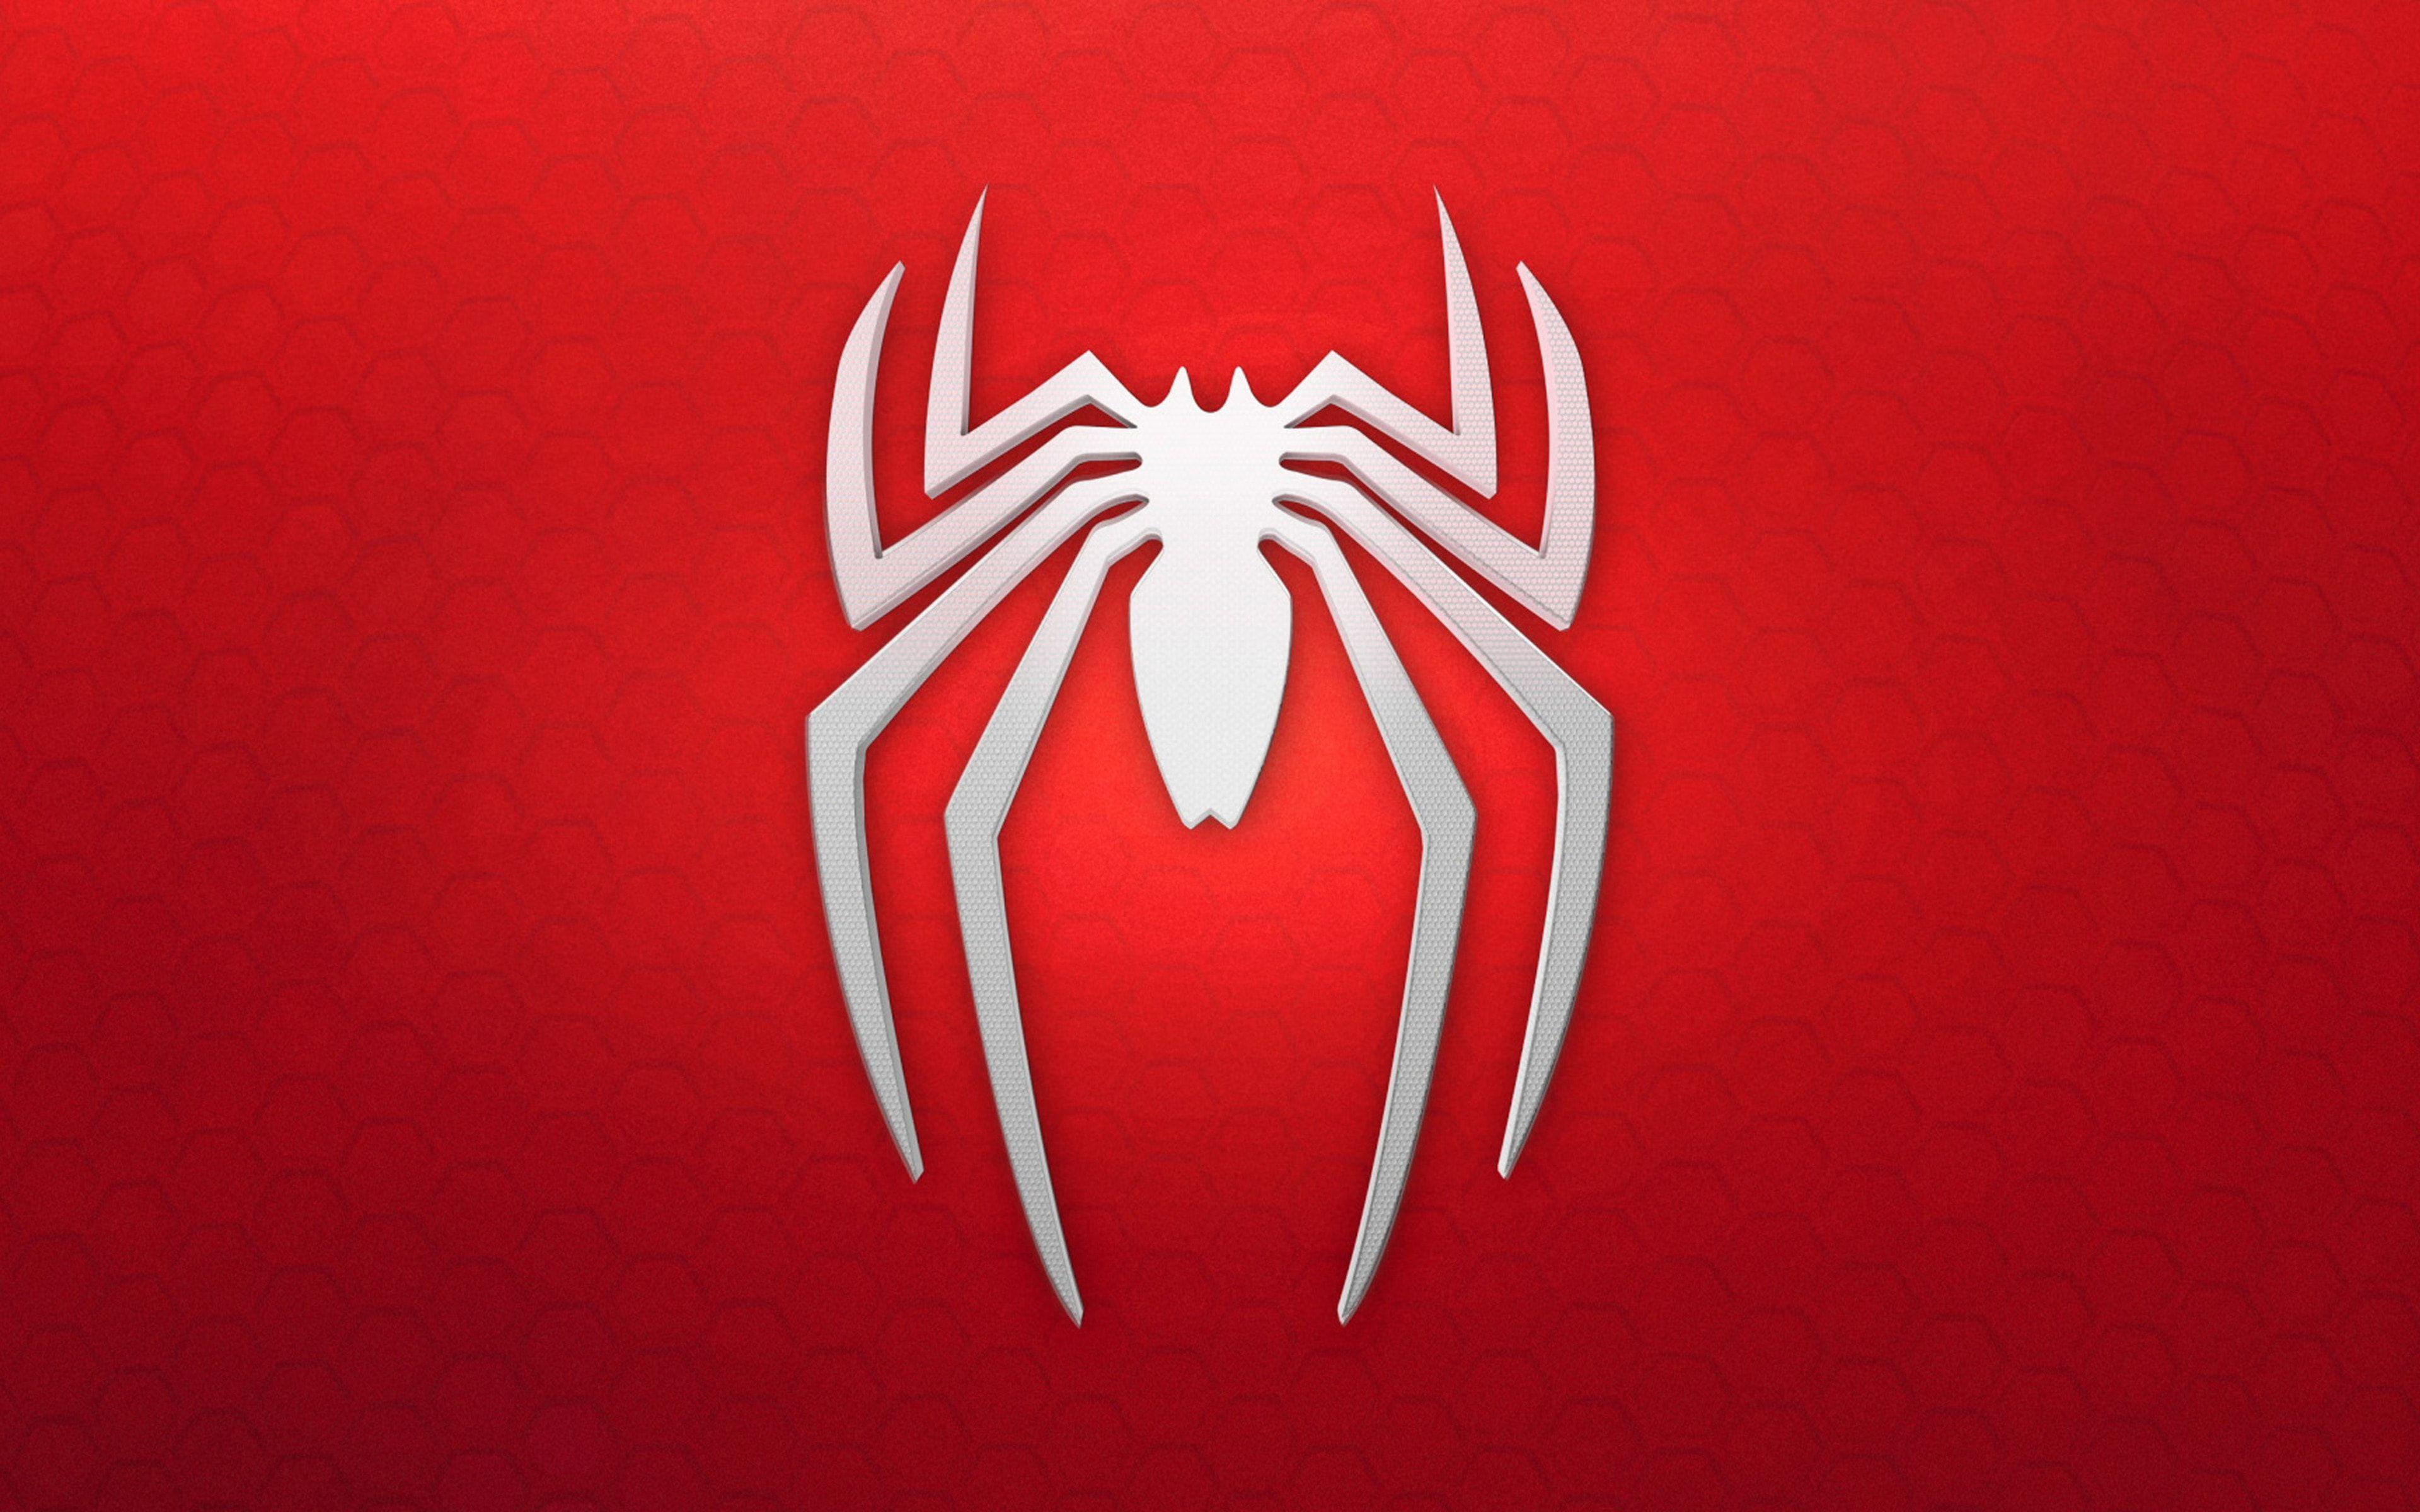 Desktophdwallpaper Org Spiderman Ps4 Wallpaper Marvel Spiderman Spider Man Ps4 Game